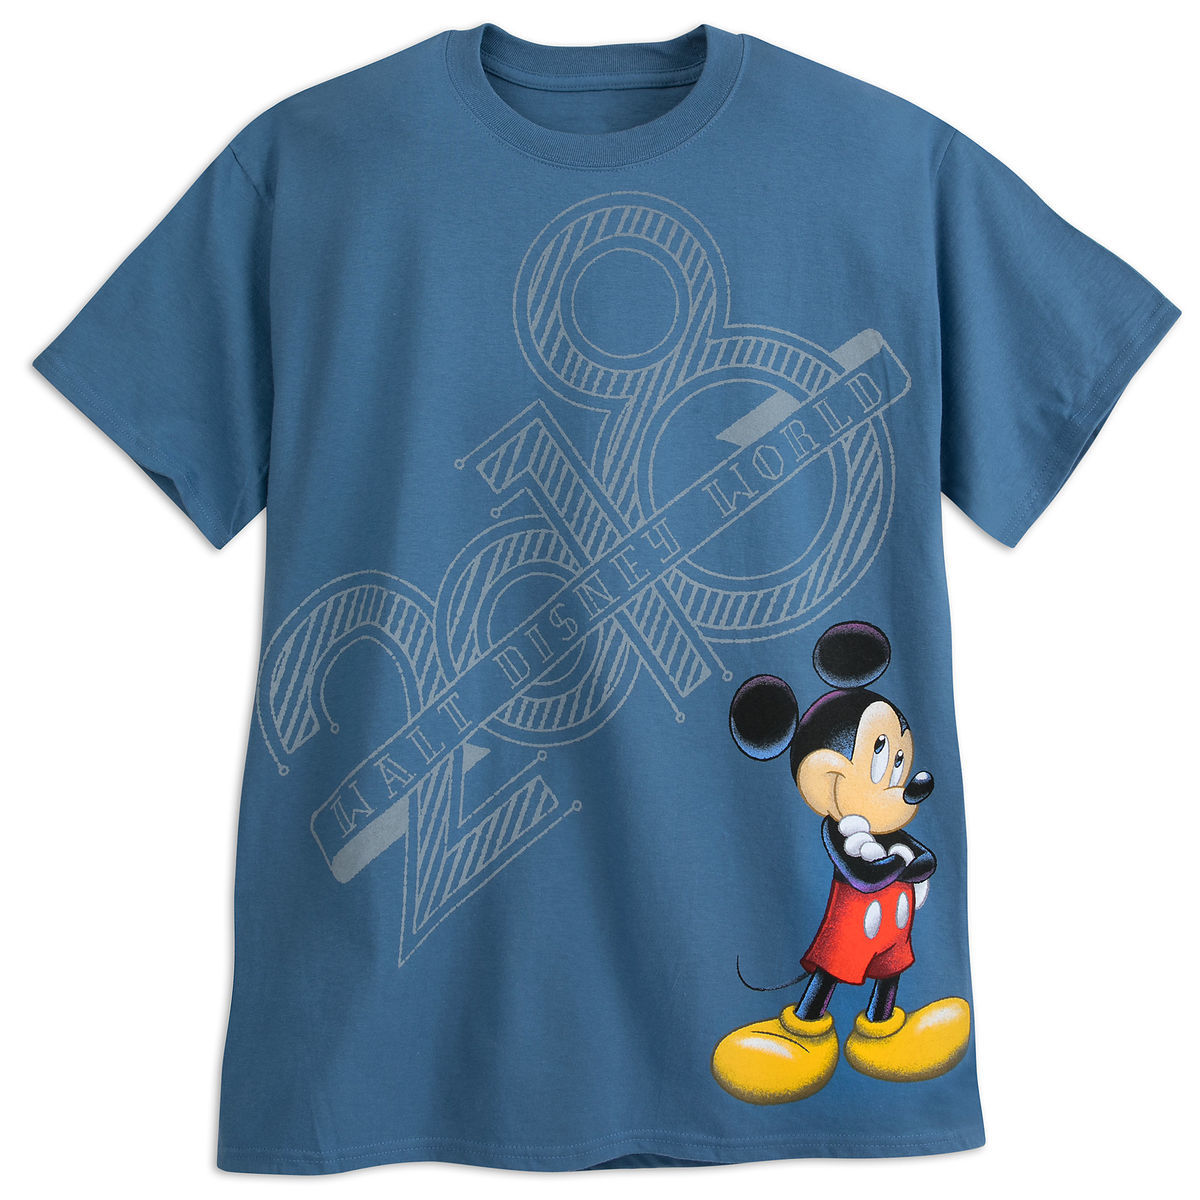 Mickey Mouse T Shirt For Adults Walt Disney World 2018 Shopdisney